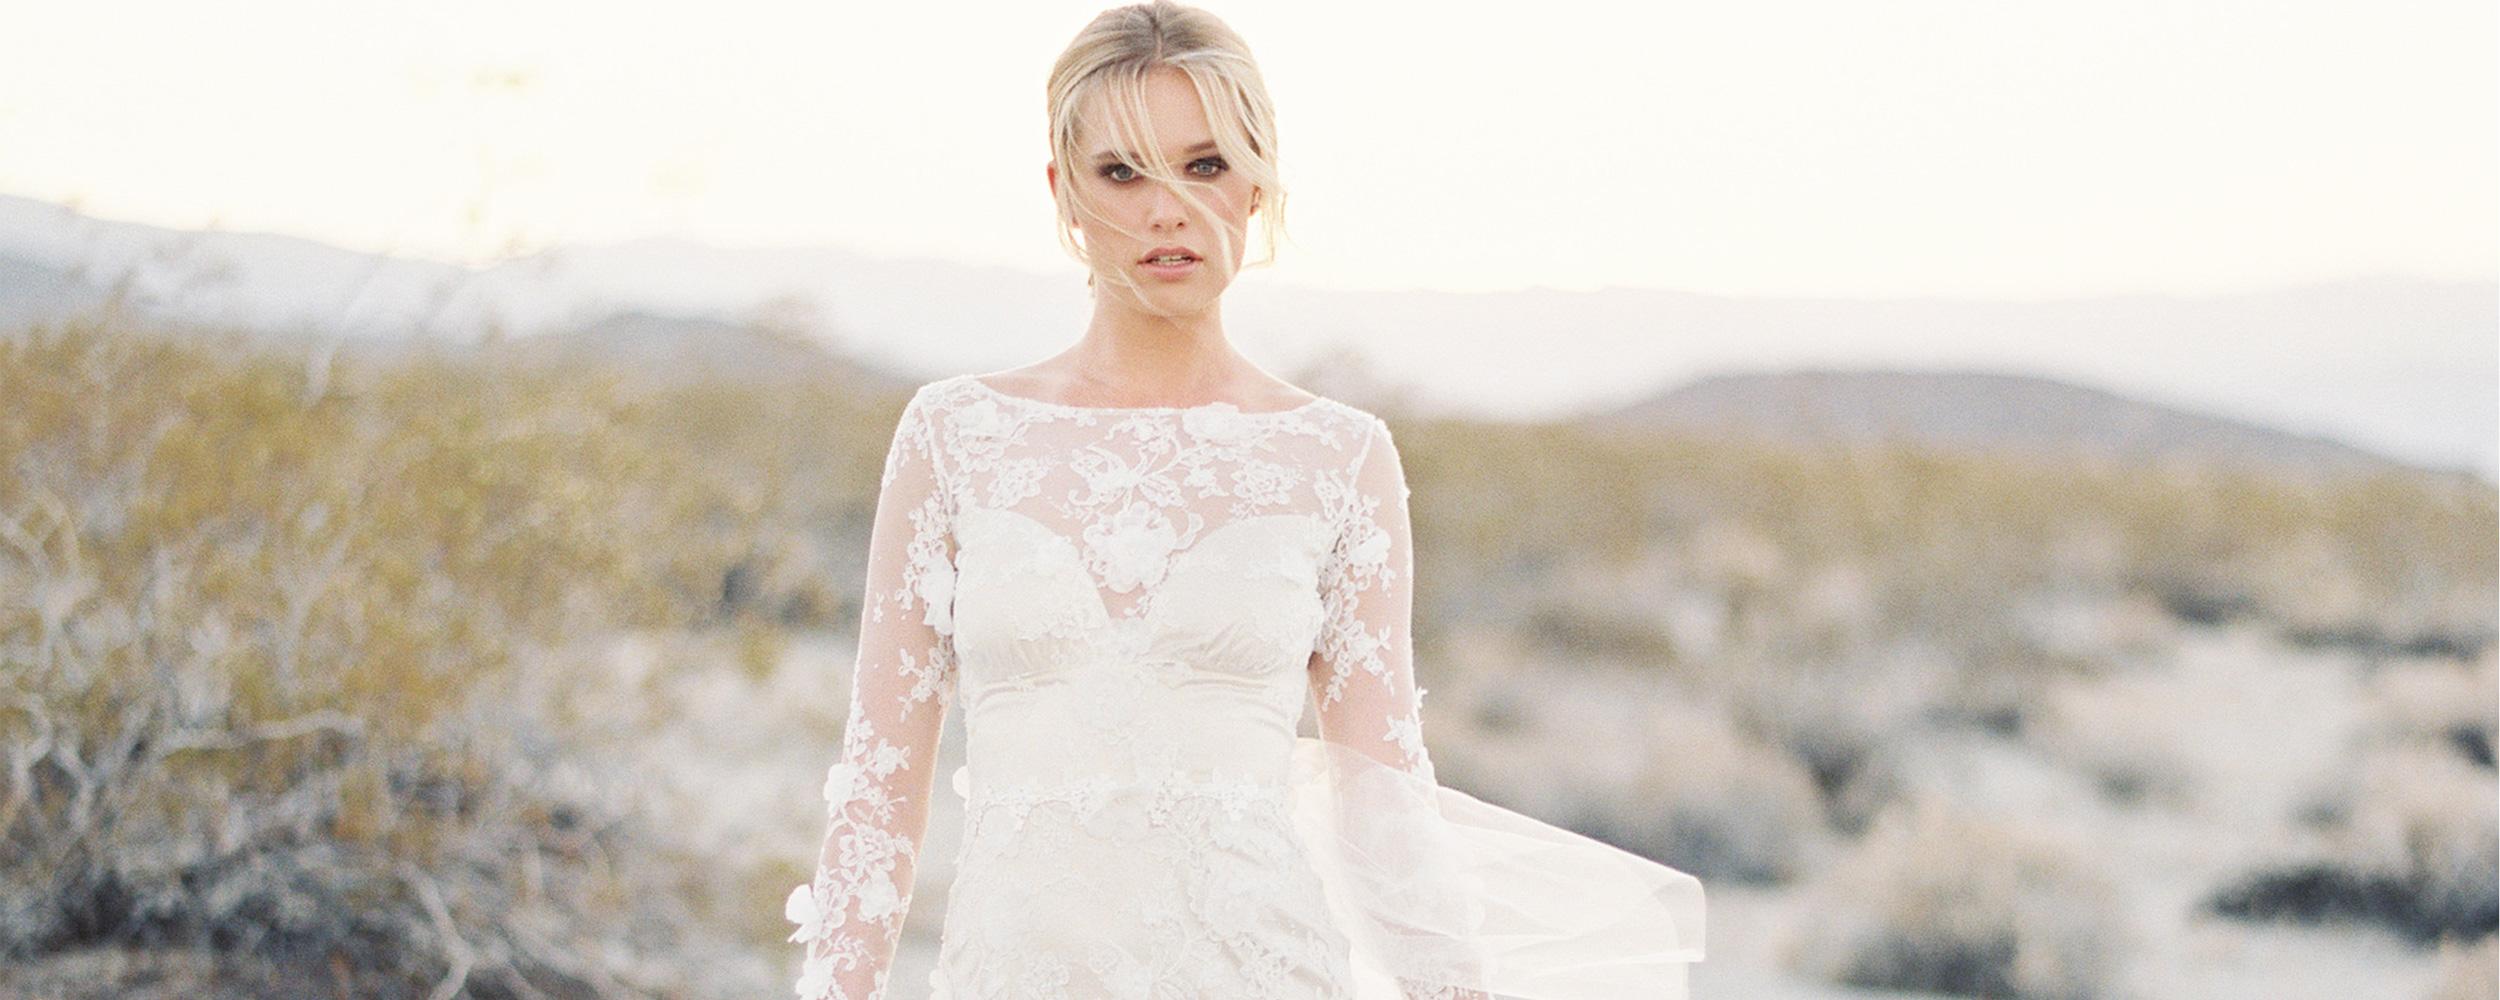 Wedding Dress Brisbane Brisbane Babushka Ballerina